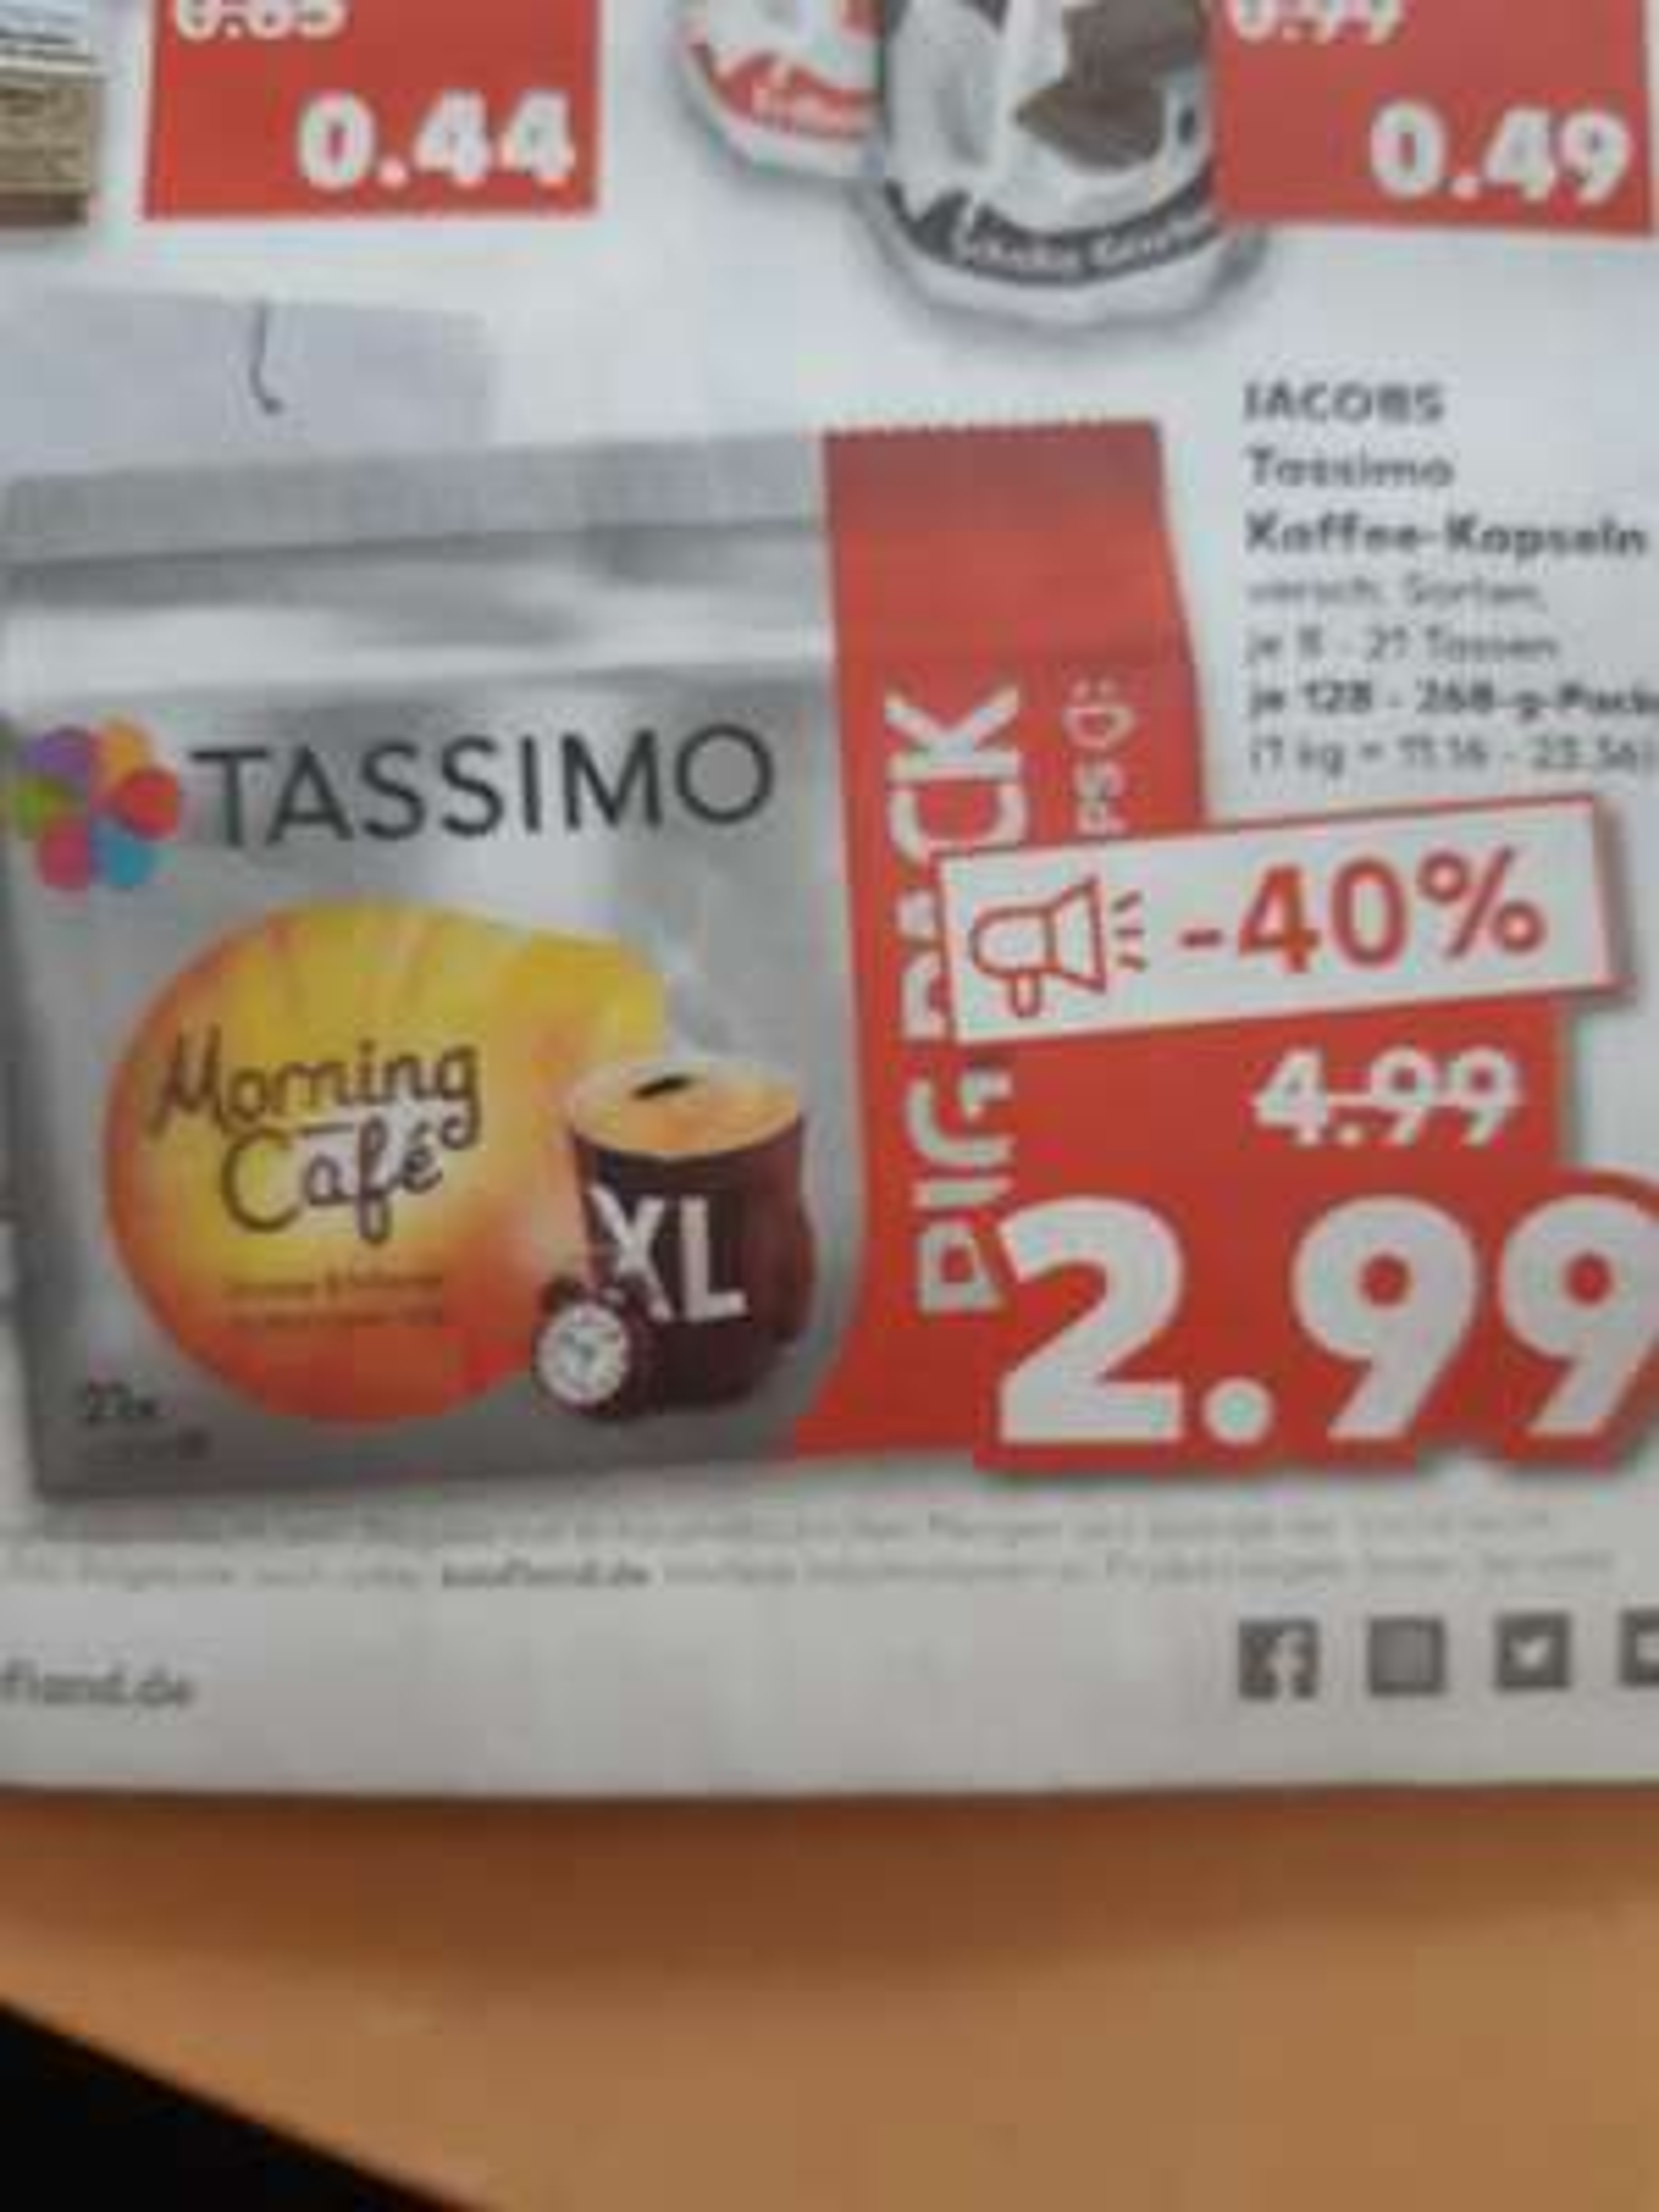 [Kaufland]Tassimo Kaffee-Kapseln